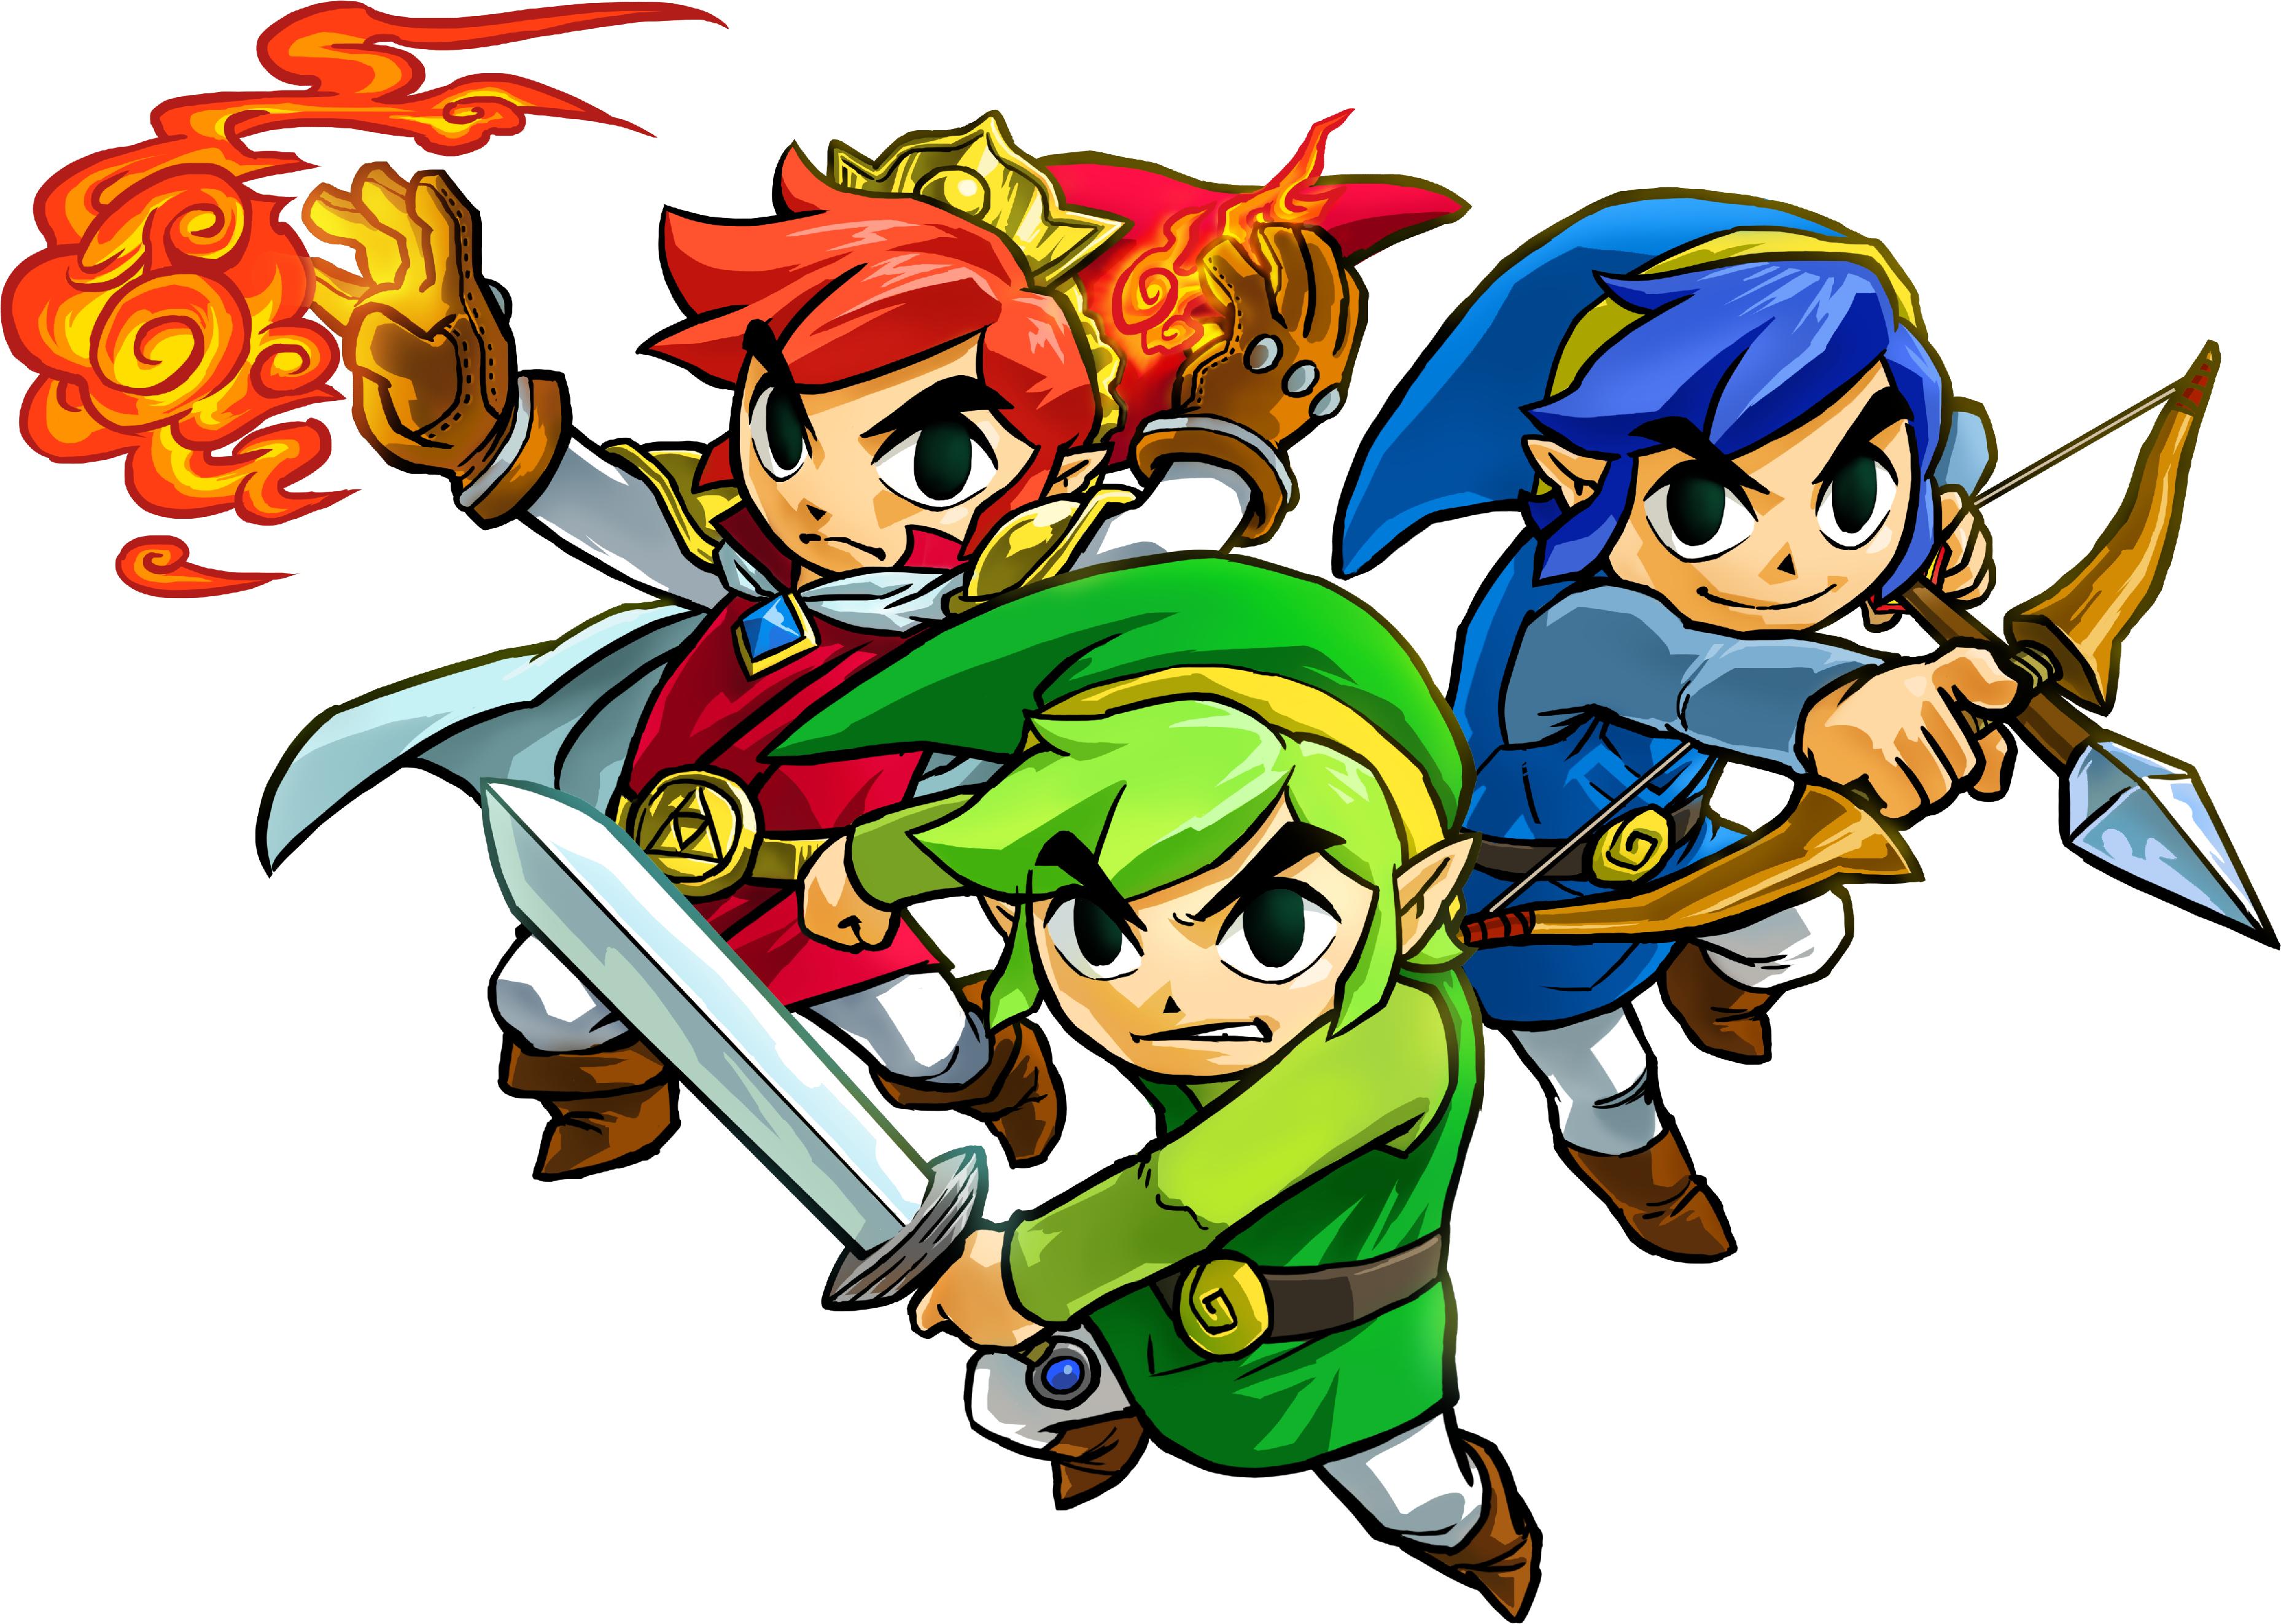 Link | The Legend of Zelda Wiki | FANDOM powered by Wikia